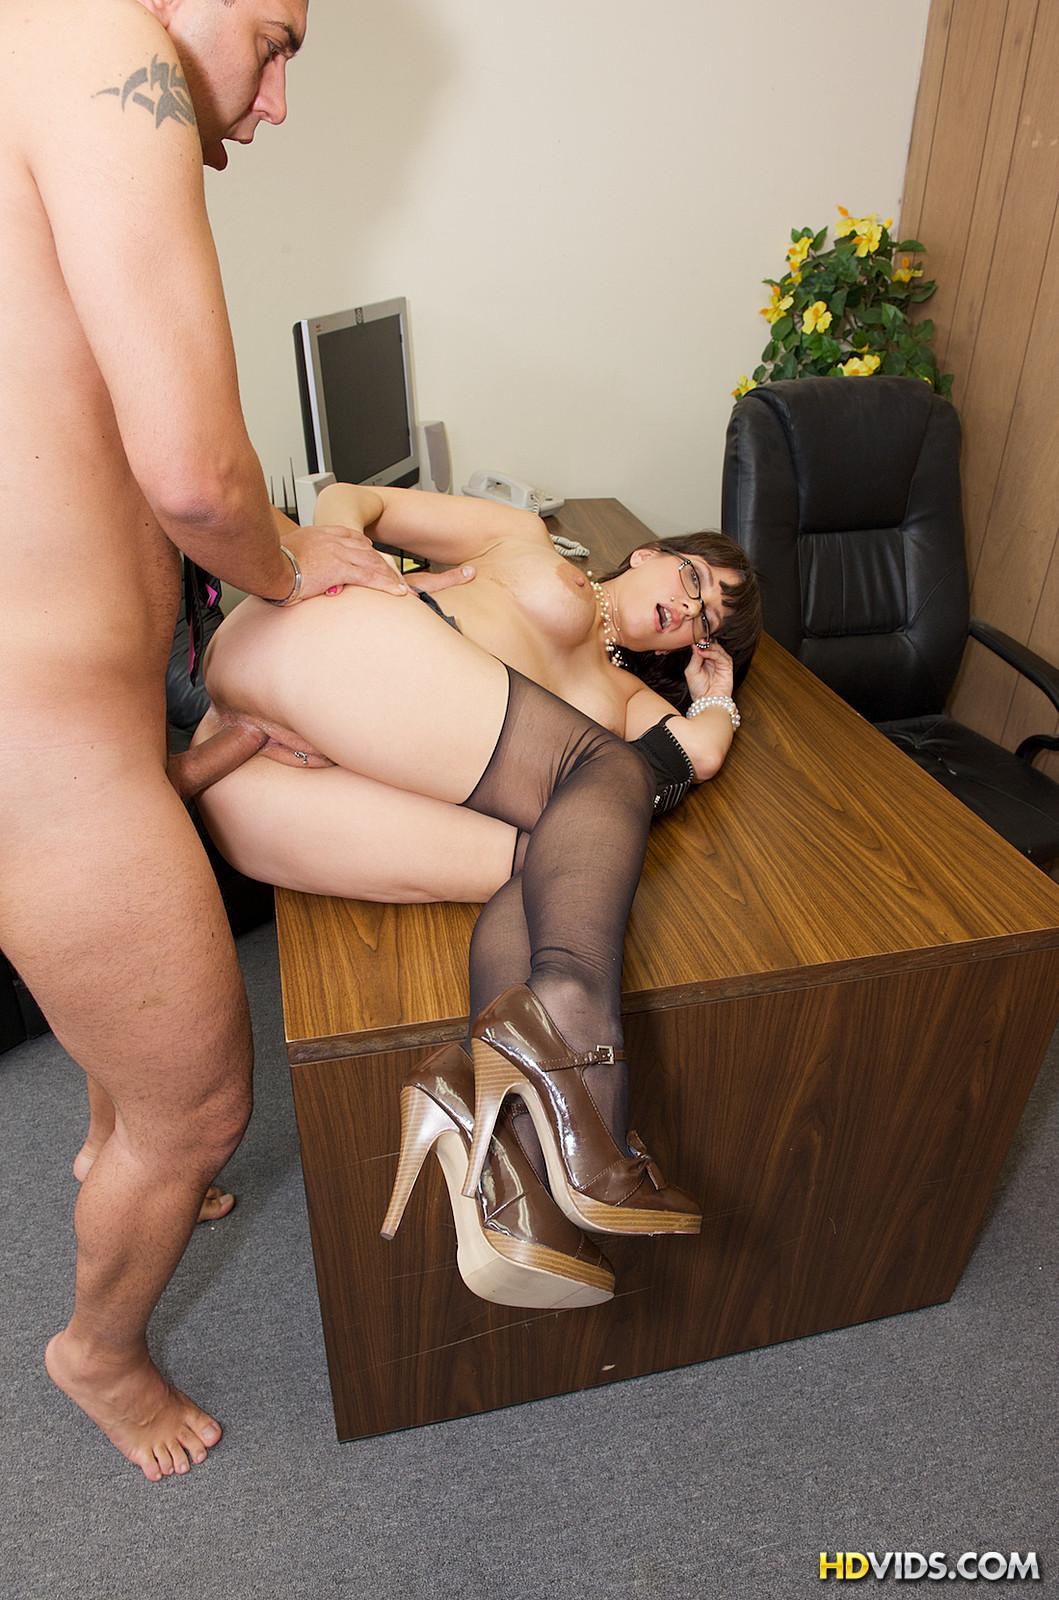 Секс у босса дома 10 фотография